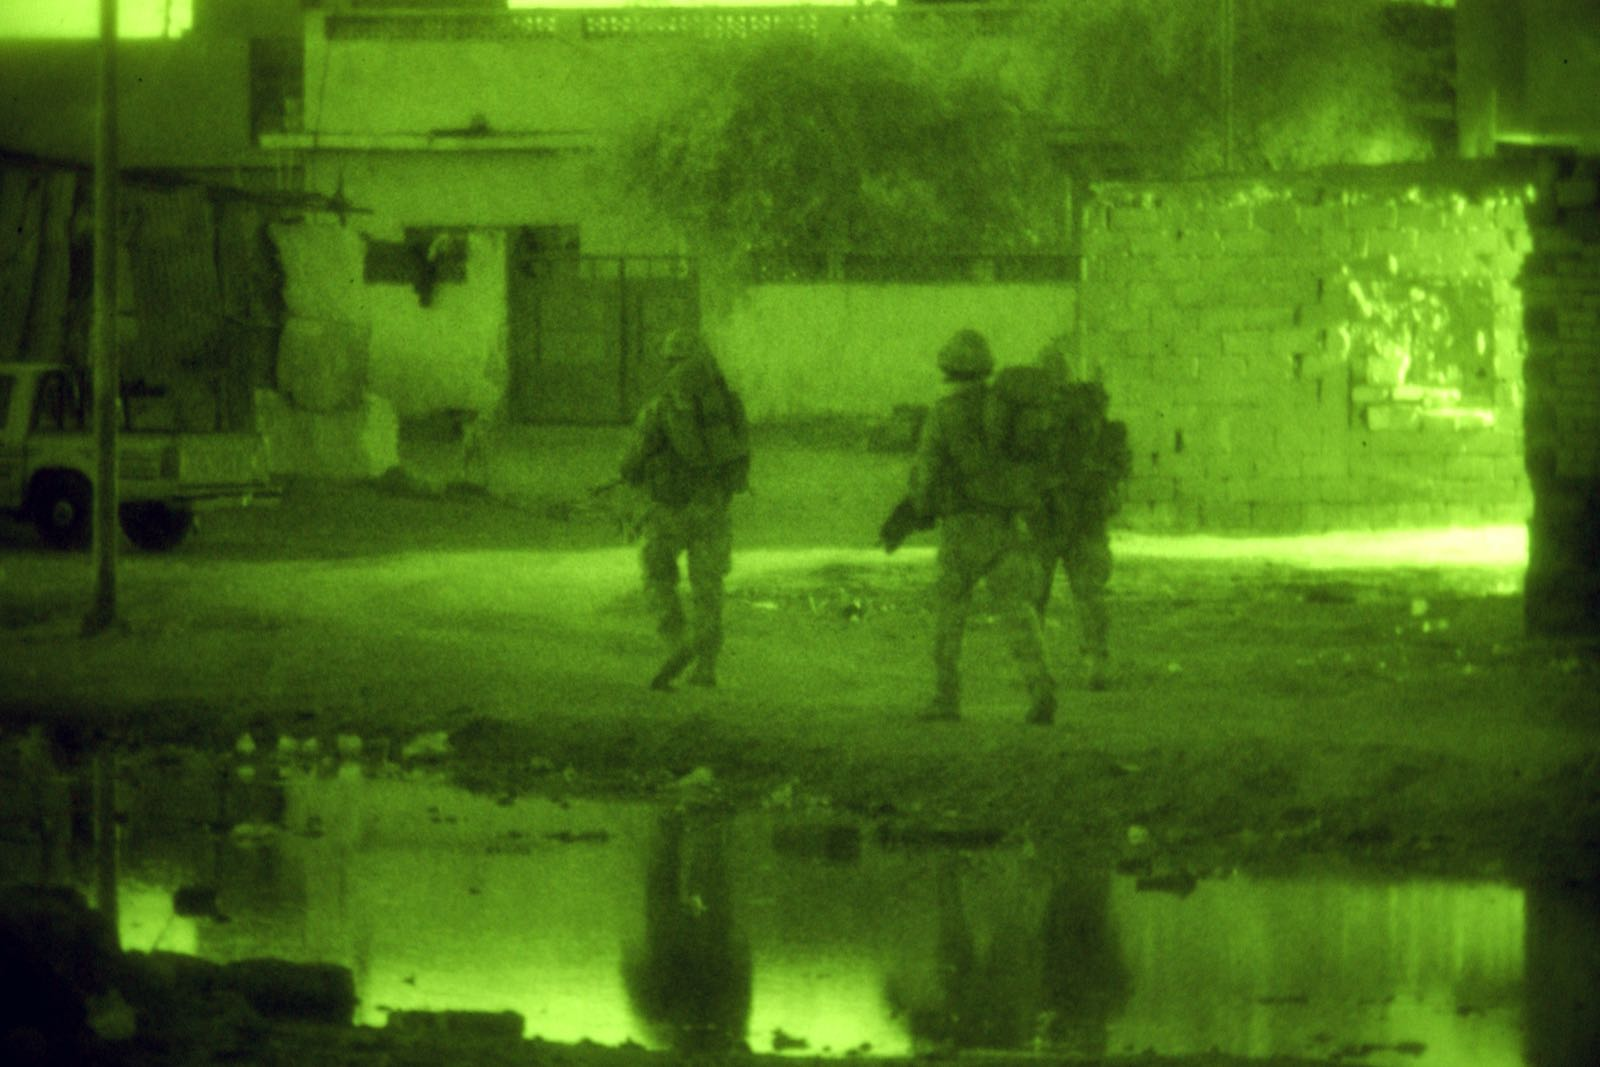 British soldiers patrolling near Sharkarta, Iraq in 2005 (UK Ministry of Defence)